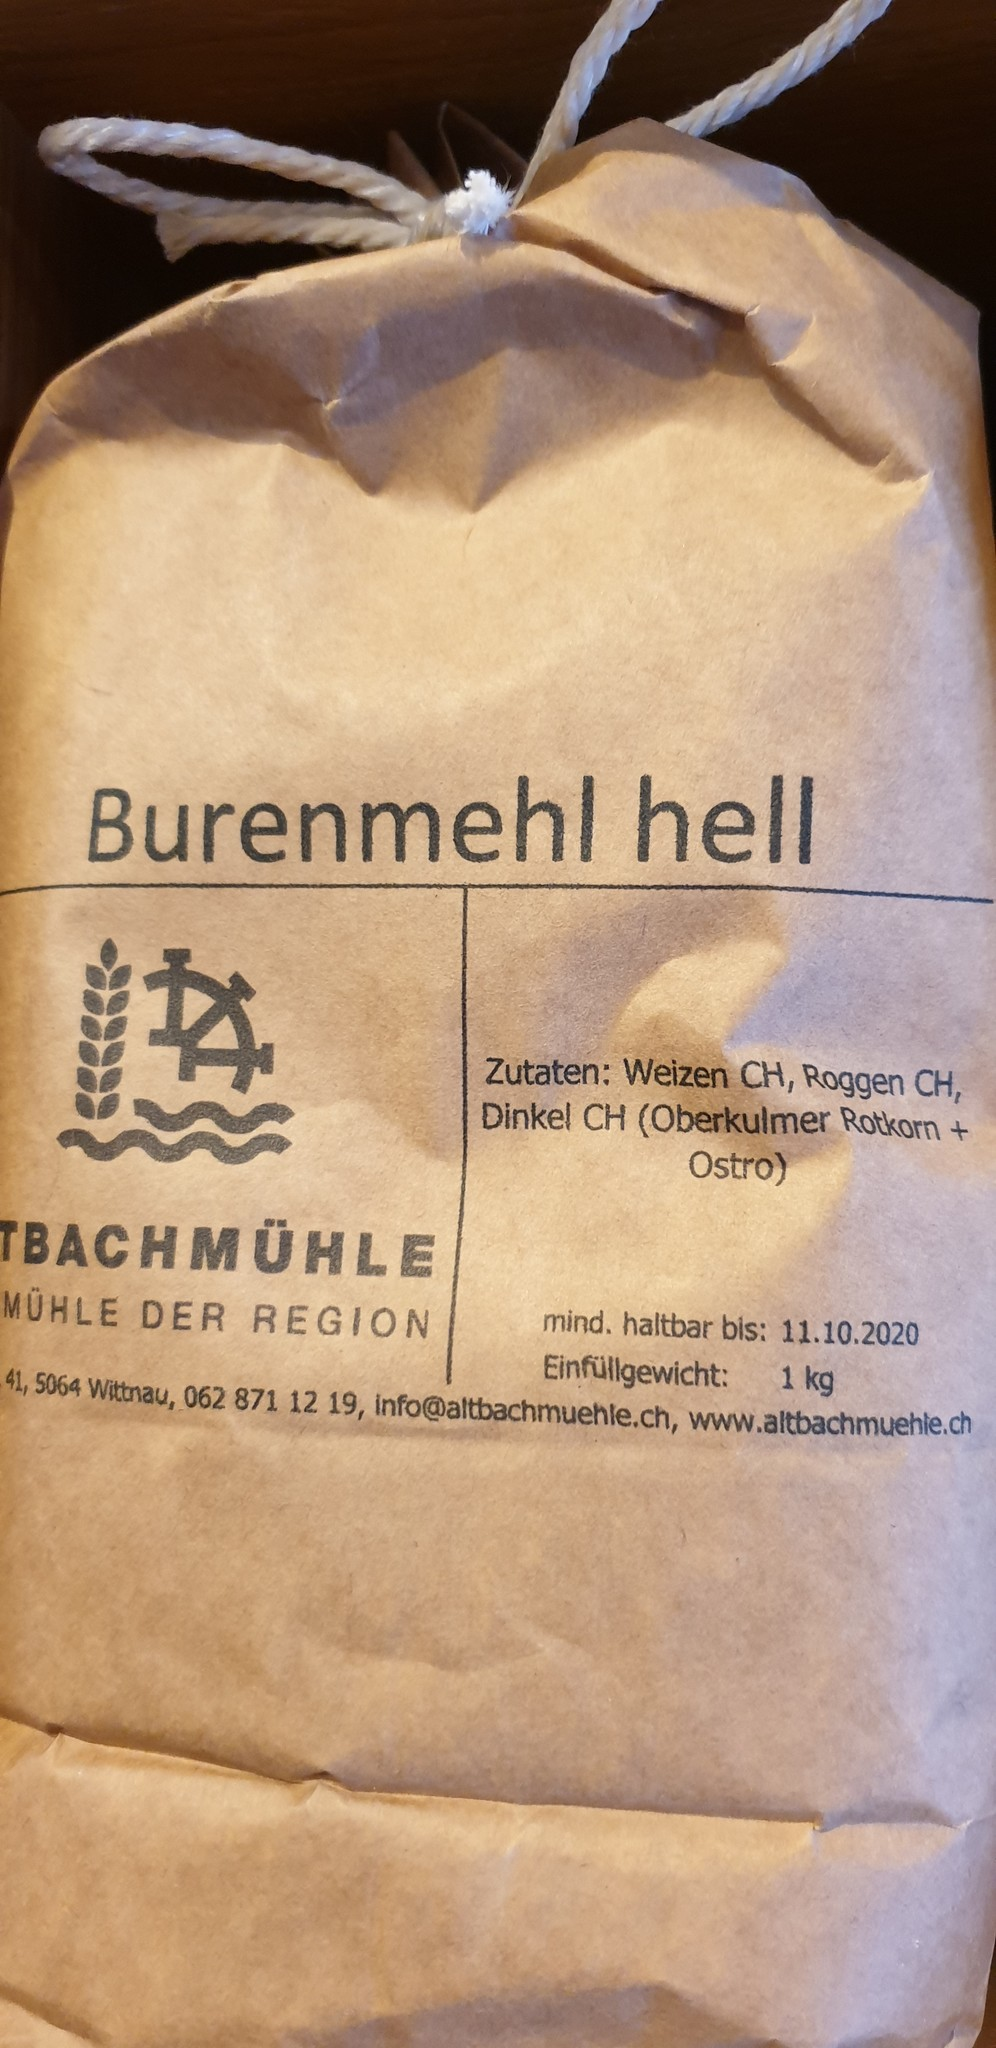 Altbachmühle Burenmehl hell 1kg Altbachmühle